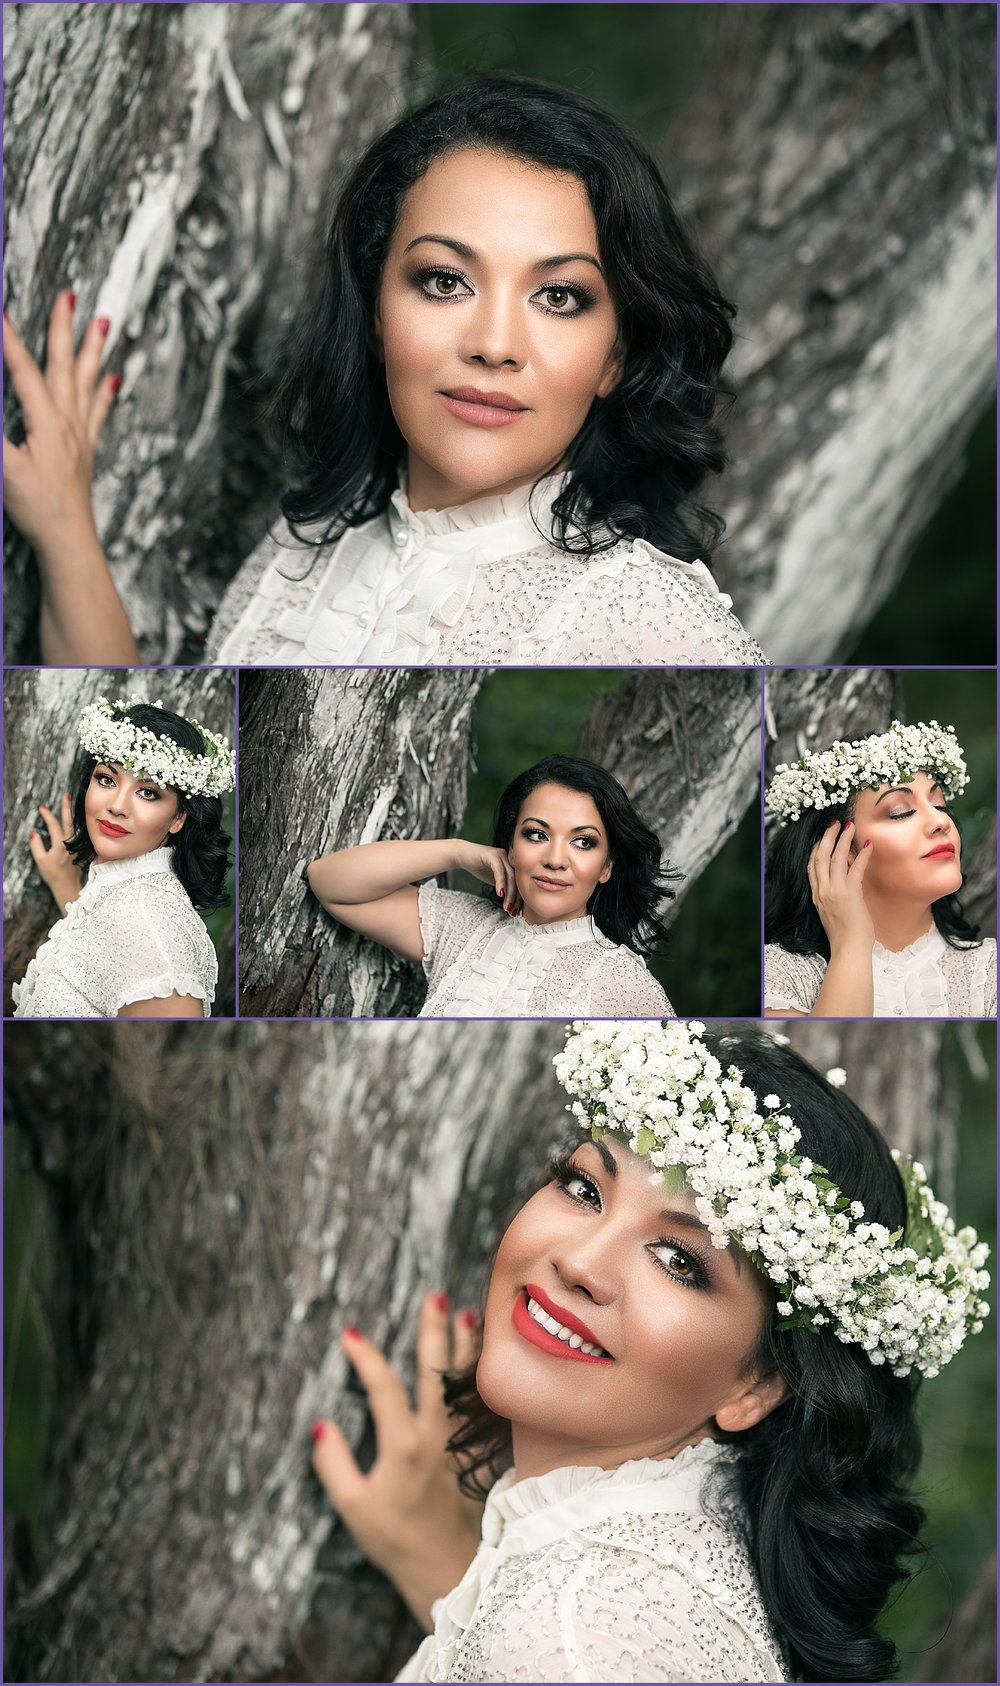 Before and after makeover - Hawaii glamour photographer - Honolulu beauty photographer - Sarai Espinoza mua